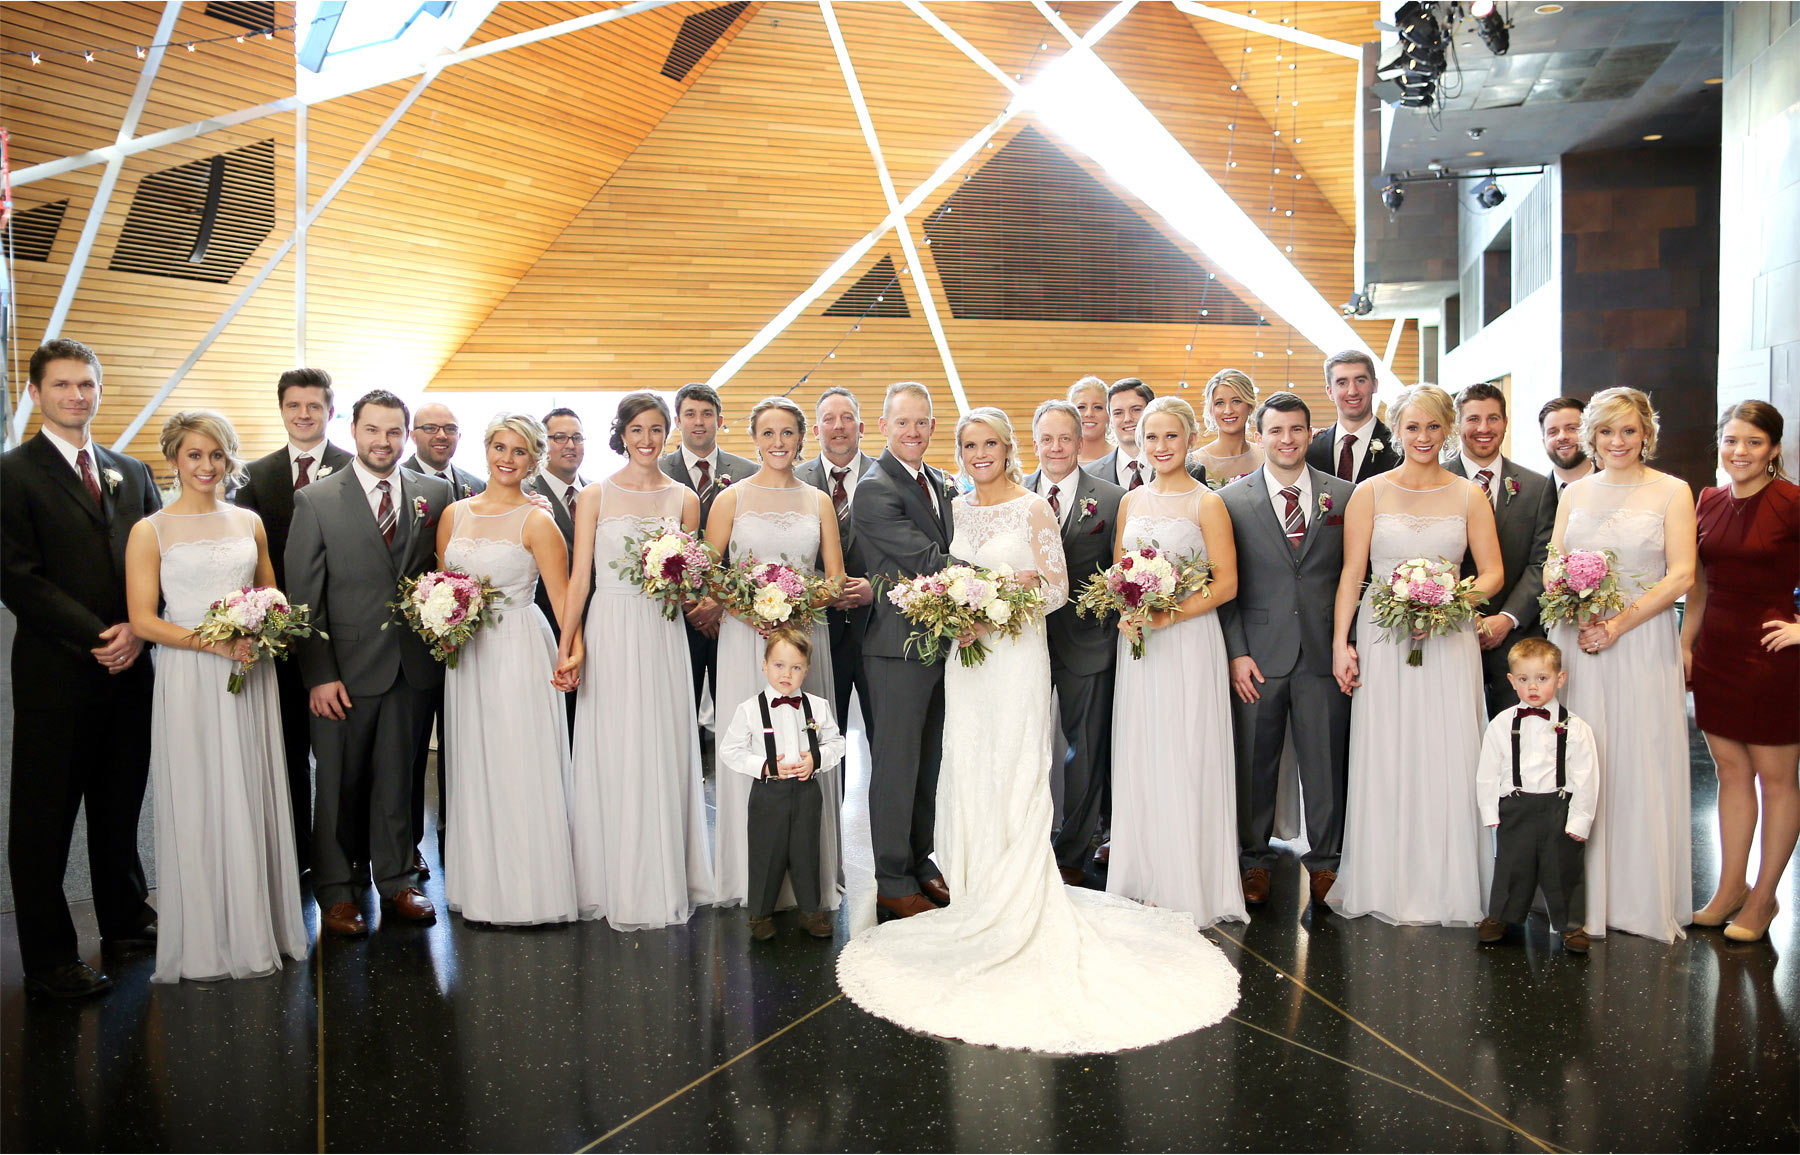 09-Minneapolis-Minnesota-Wedding-Photographer-by-Andrew-Vick-Photography-Winter-McNamara-Alumni-Center-Bride-Groom-Bridal-Party-Bridesmaids-Groomsmen-Flowers-Ring-Bearer-Brittany-and-Joseph.jpg